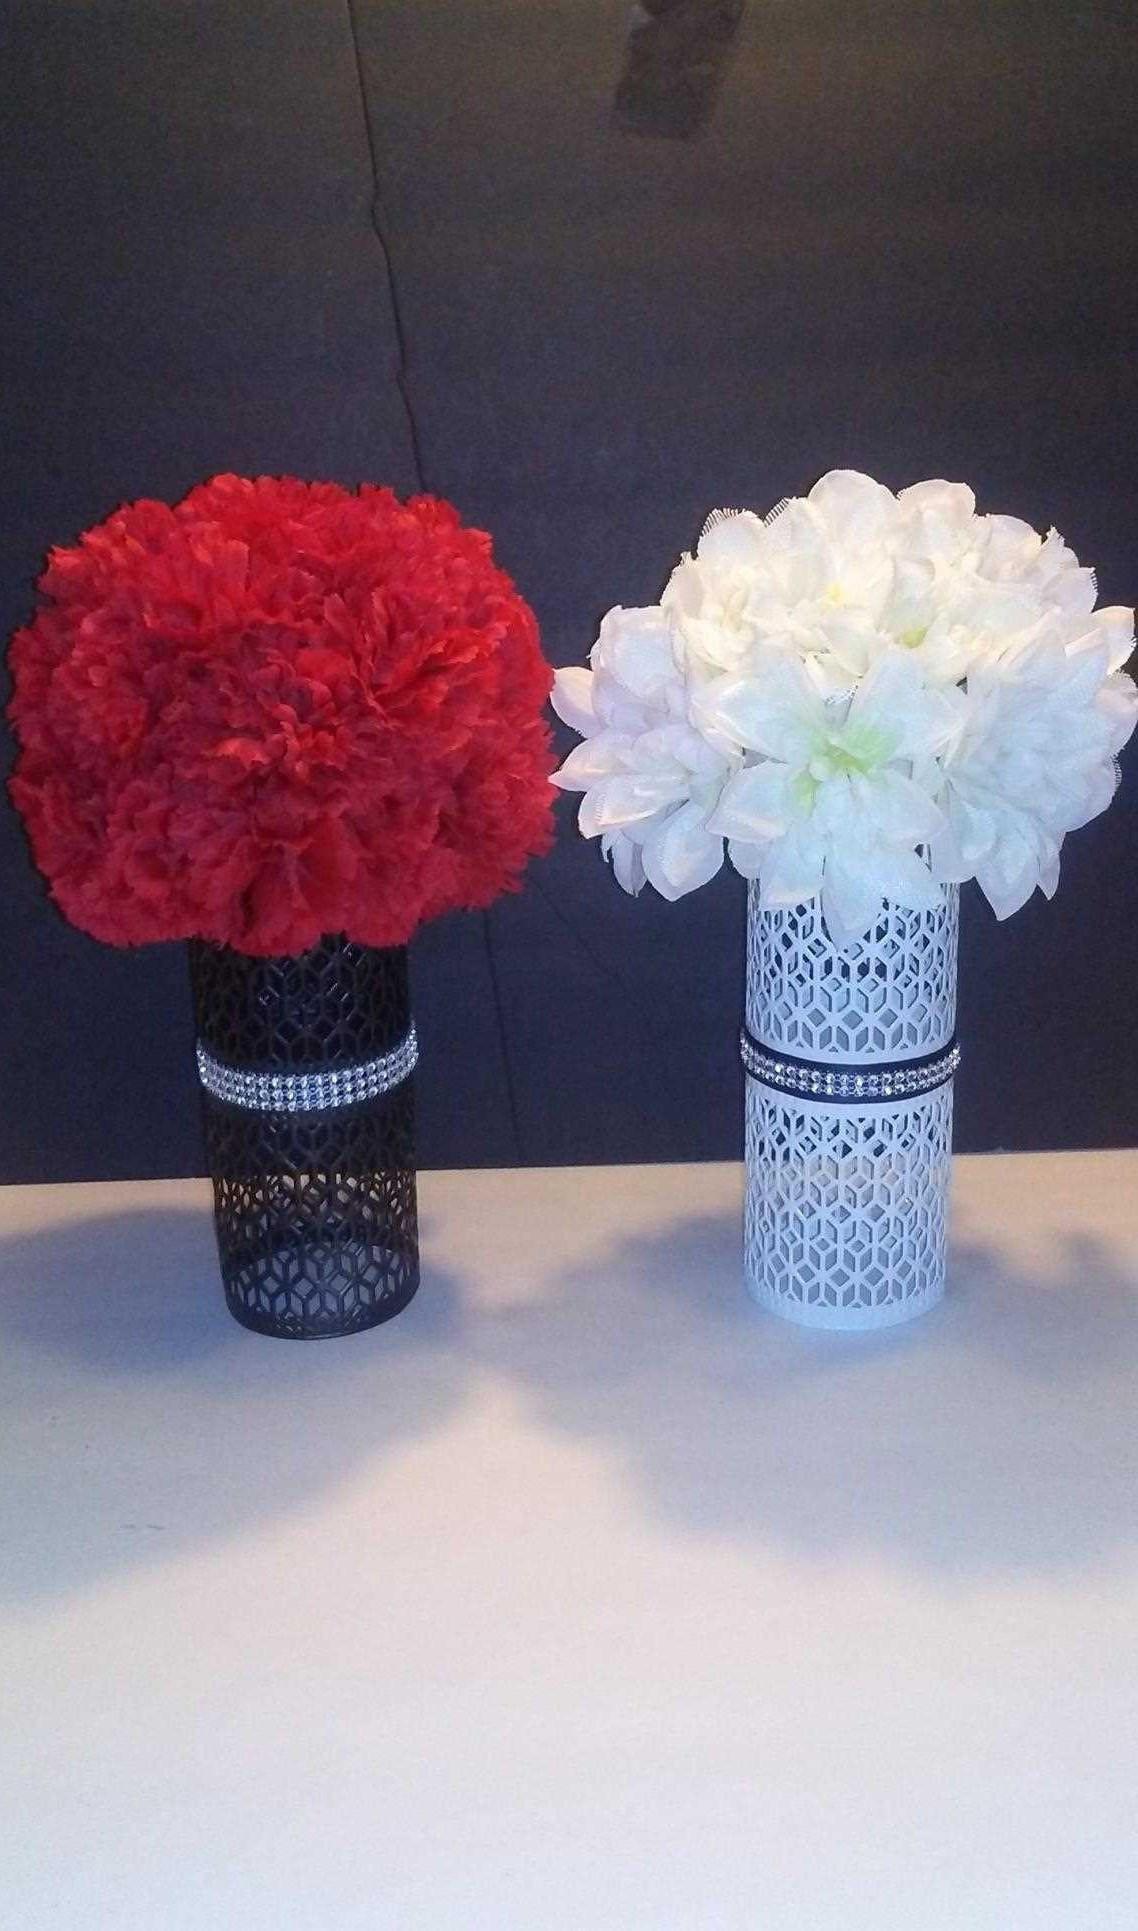 vases for sale of wedding vase for sale pictures il fullxfull h vases black vase white within wedding vase for sale pics dollar tree wedding decorations awesome h vases dollar vase i 0d